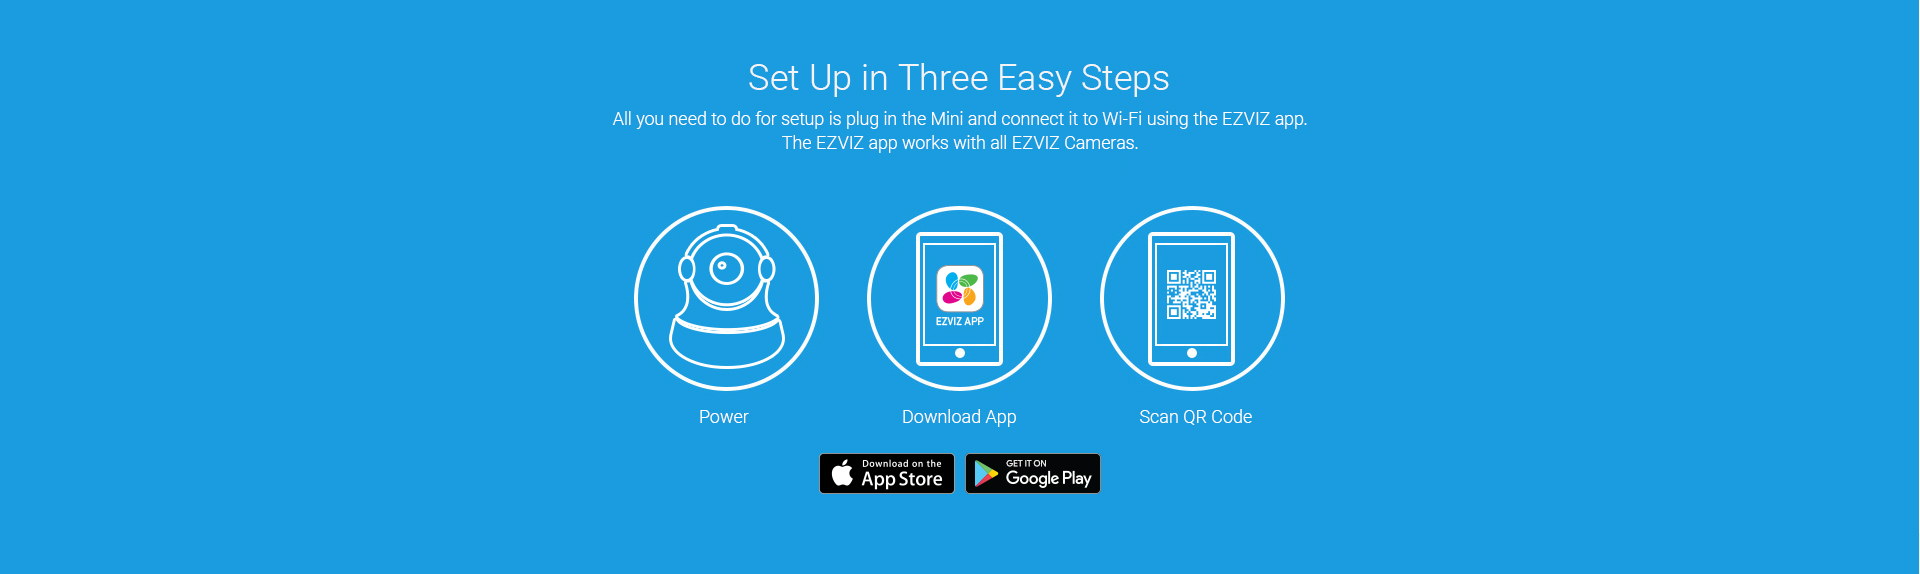 EZVIZ Mini 360 Wi-Fi Cloud Camera - 720p Pan and Tilt